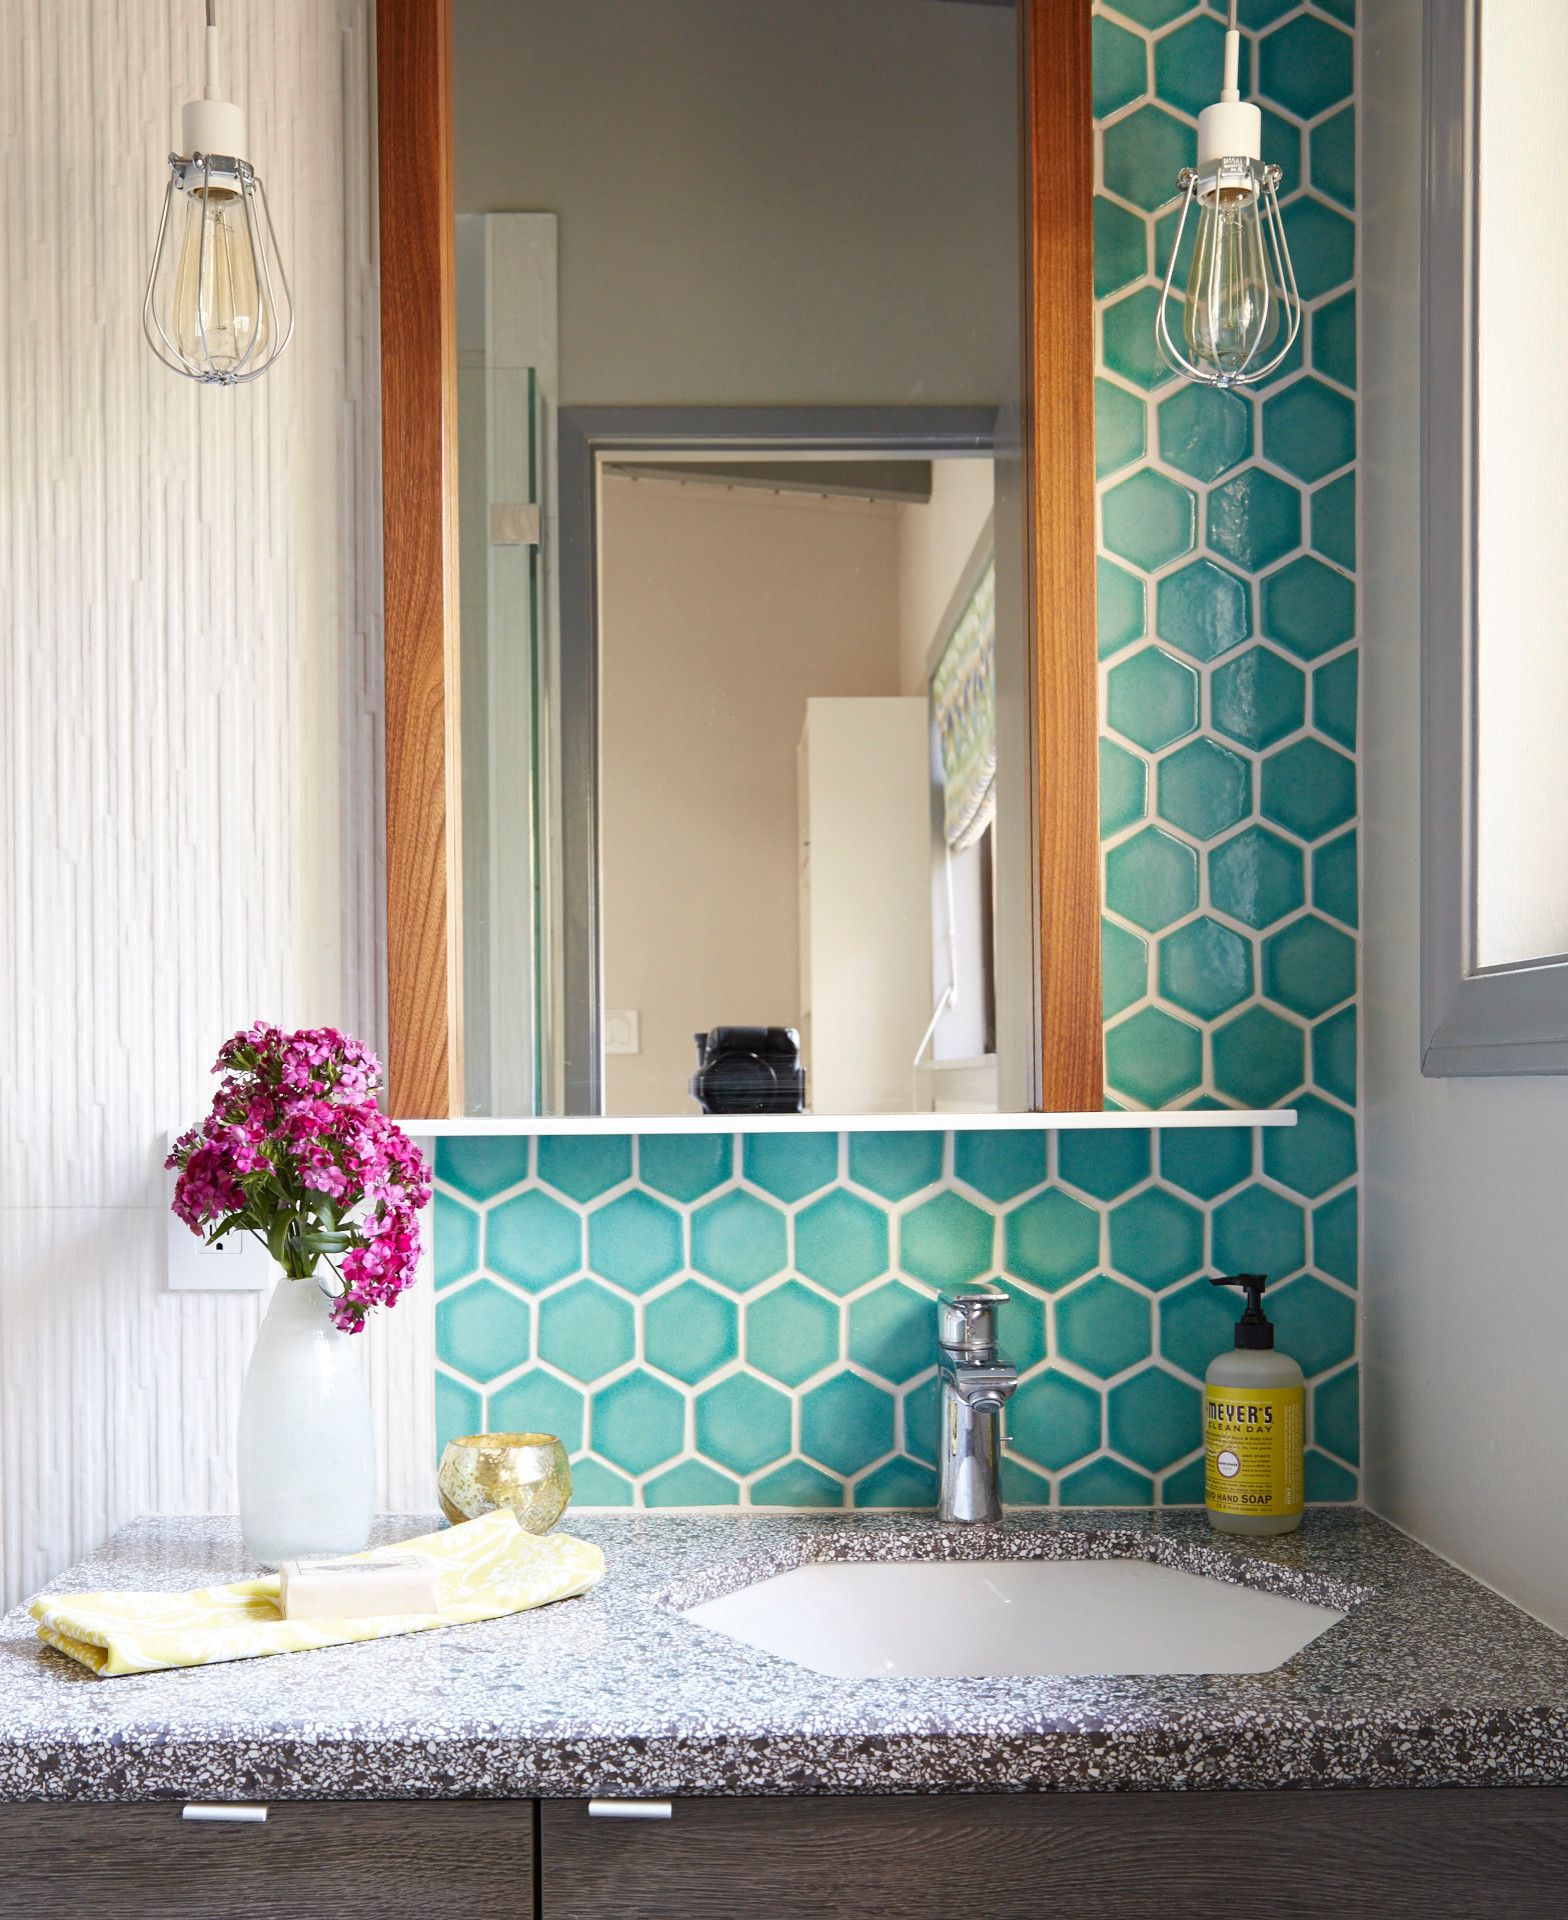 hexagonal sink